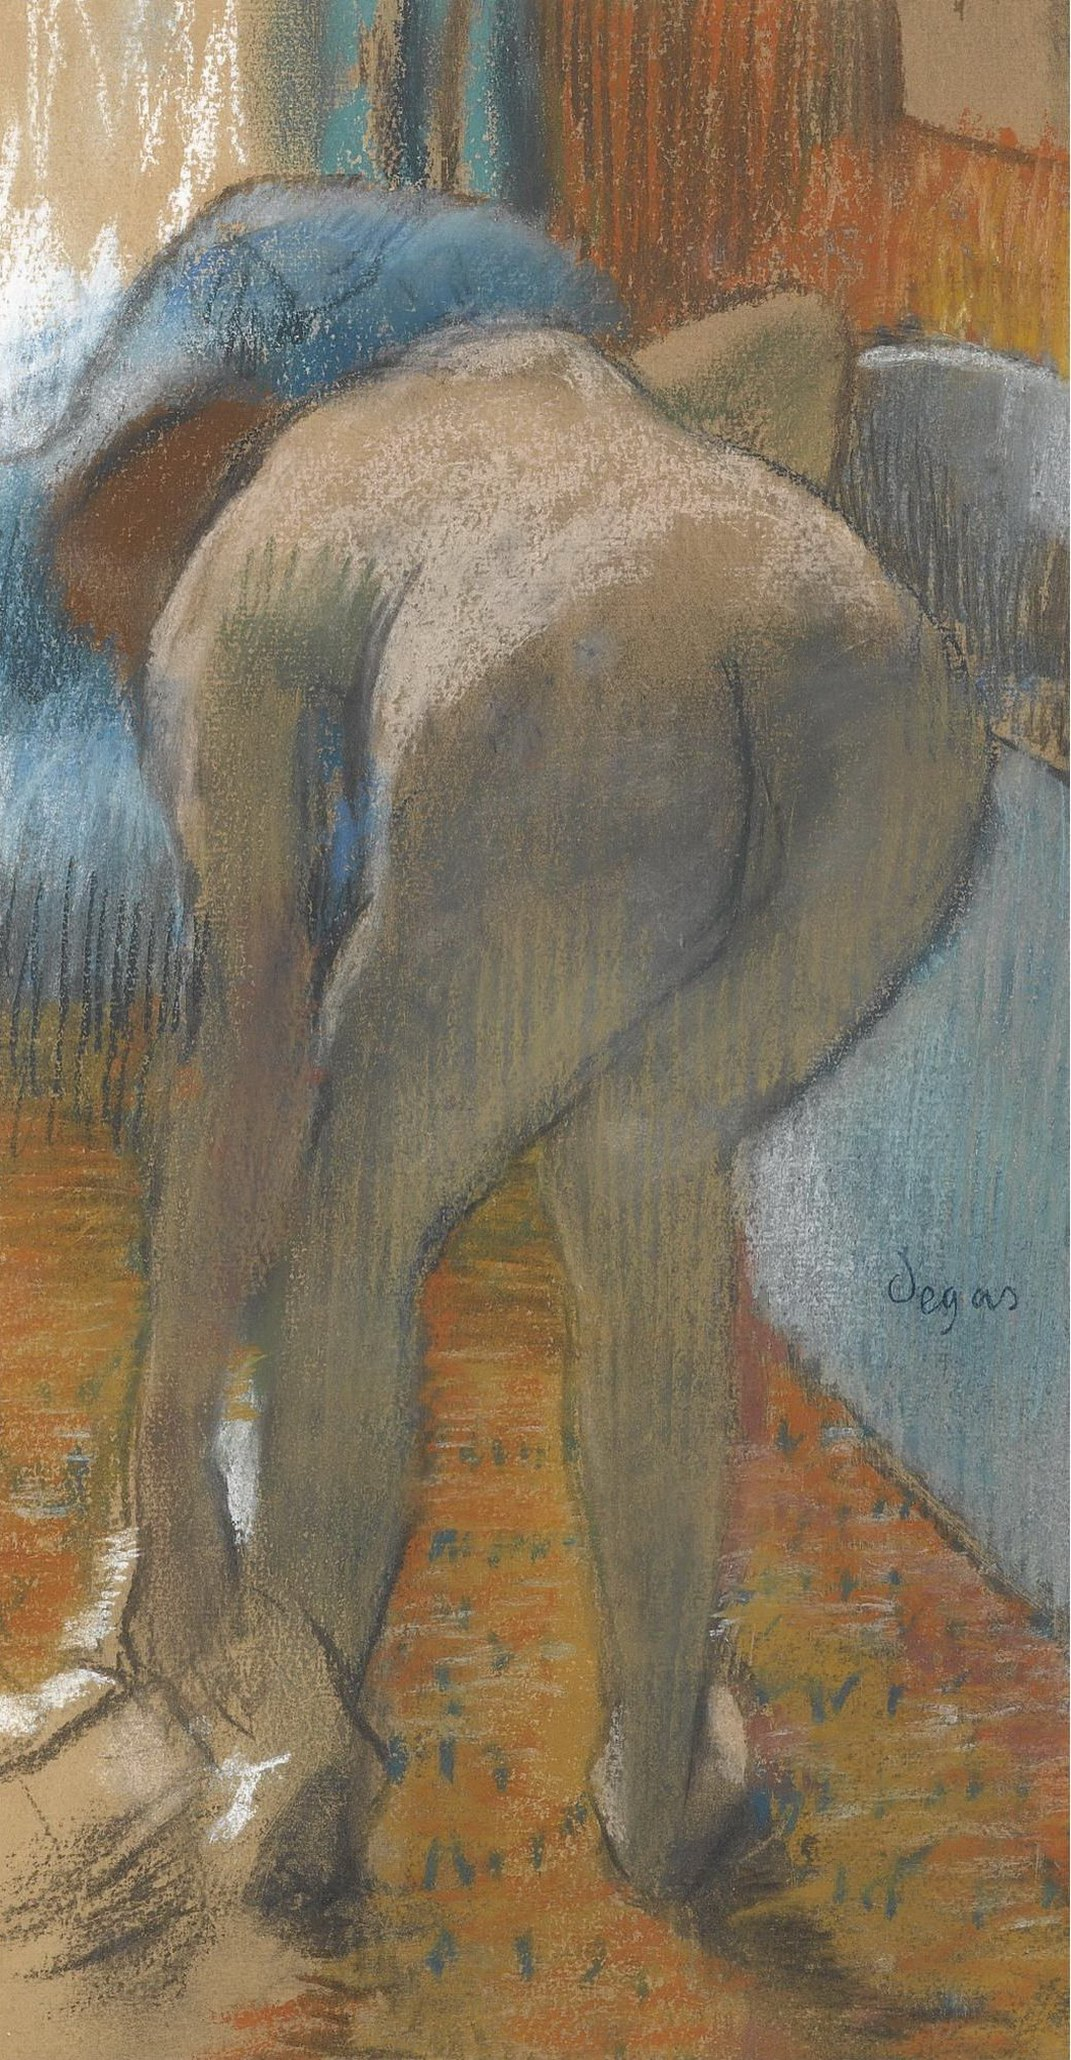 Edgar Degas, 1834-1917. Выход из ванной. 1885. 44 х 24 см. Частная коллекция